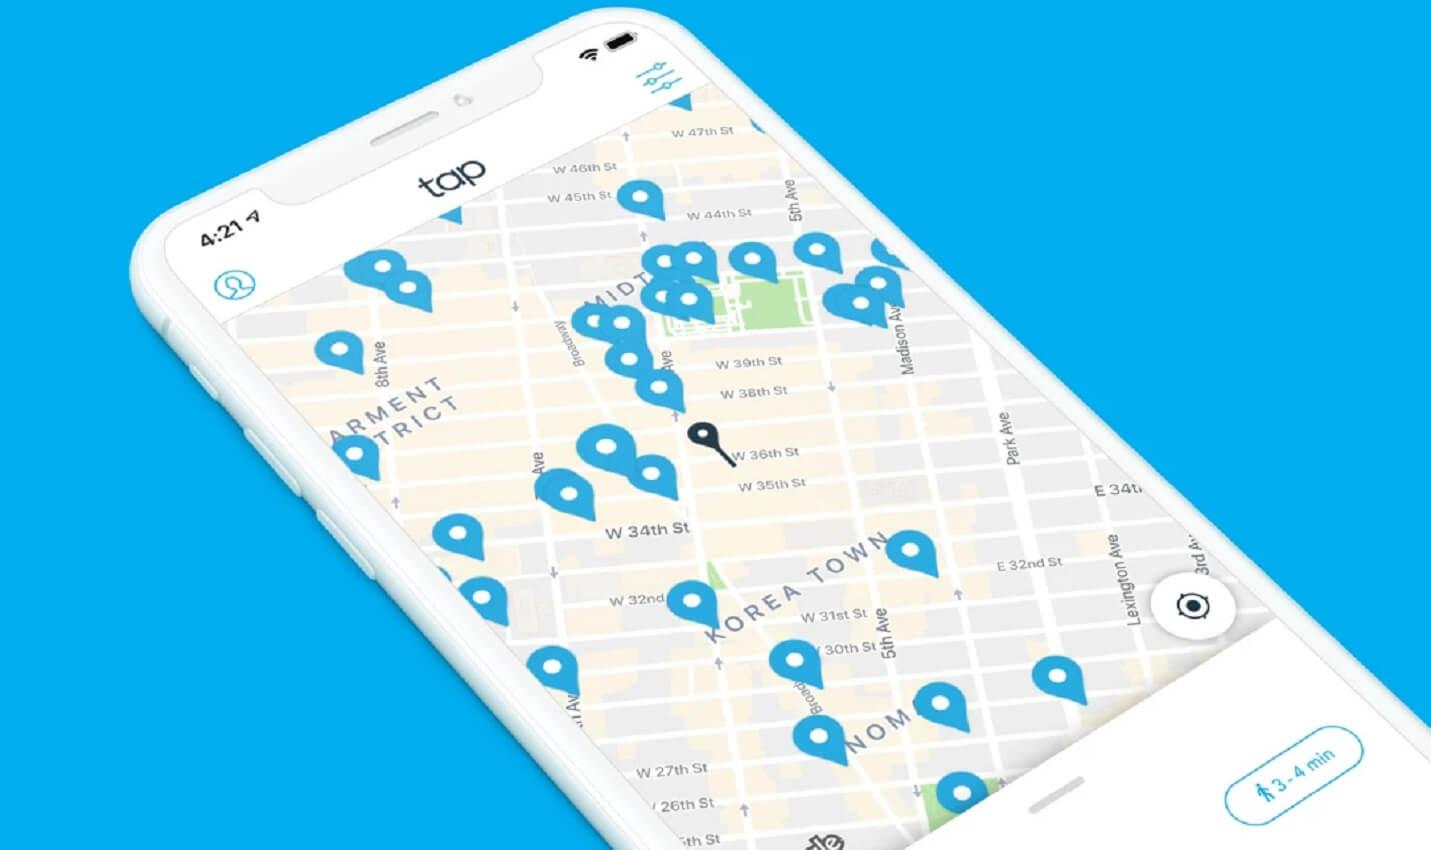 tap-app-1540338076250-1540341723835.jpg